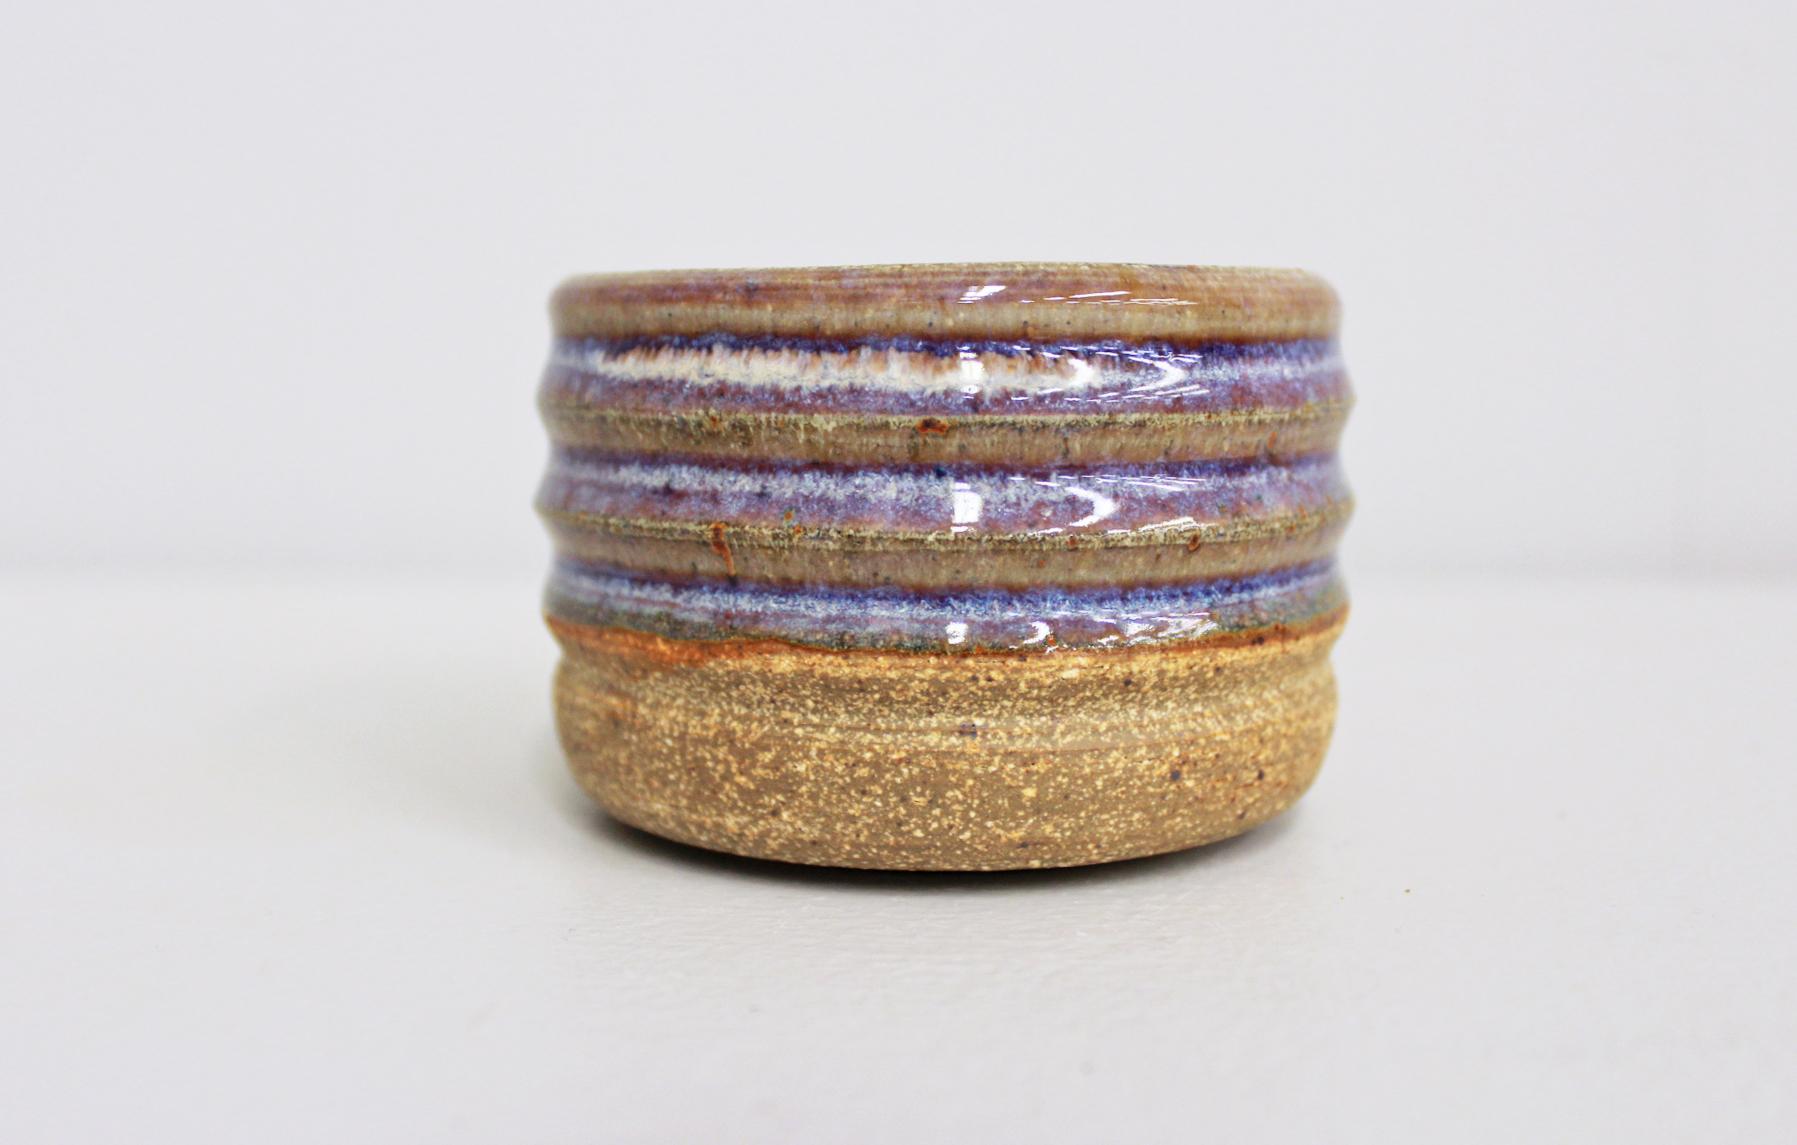 fall_2018_adv-ceramics_0046b.JPG